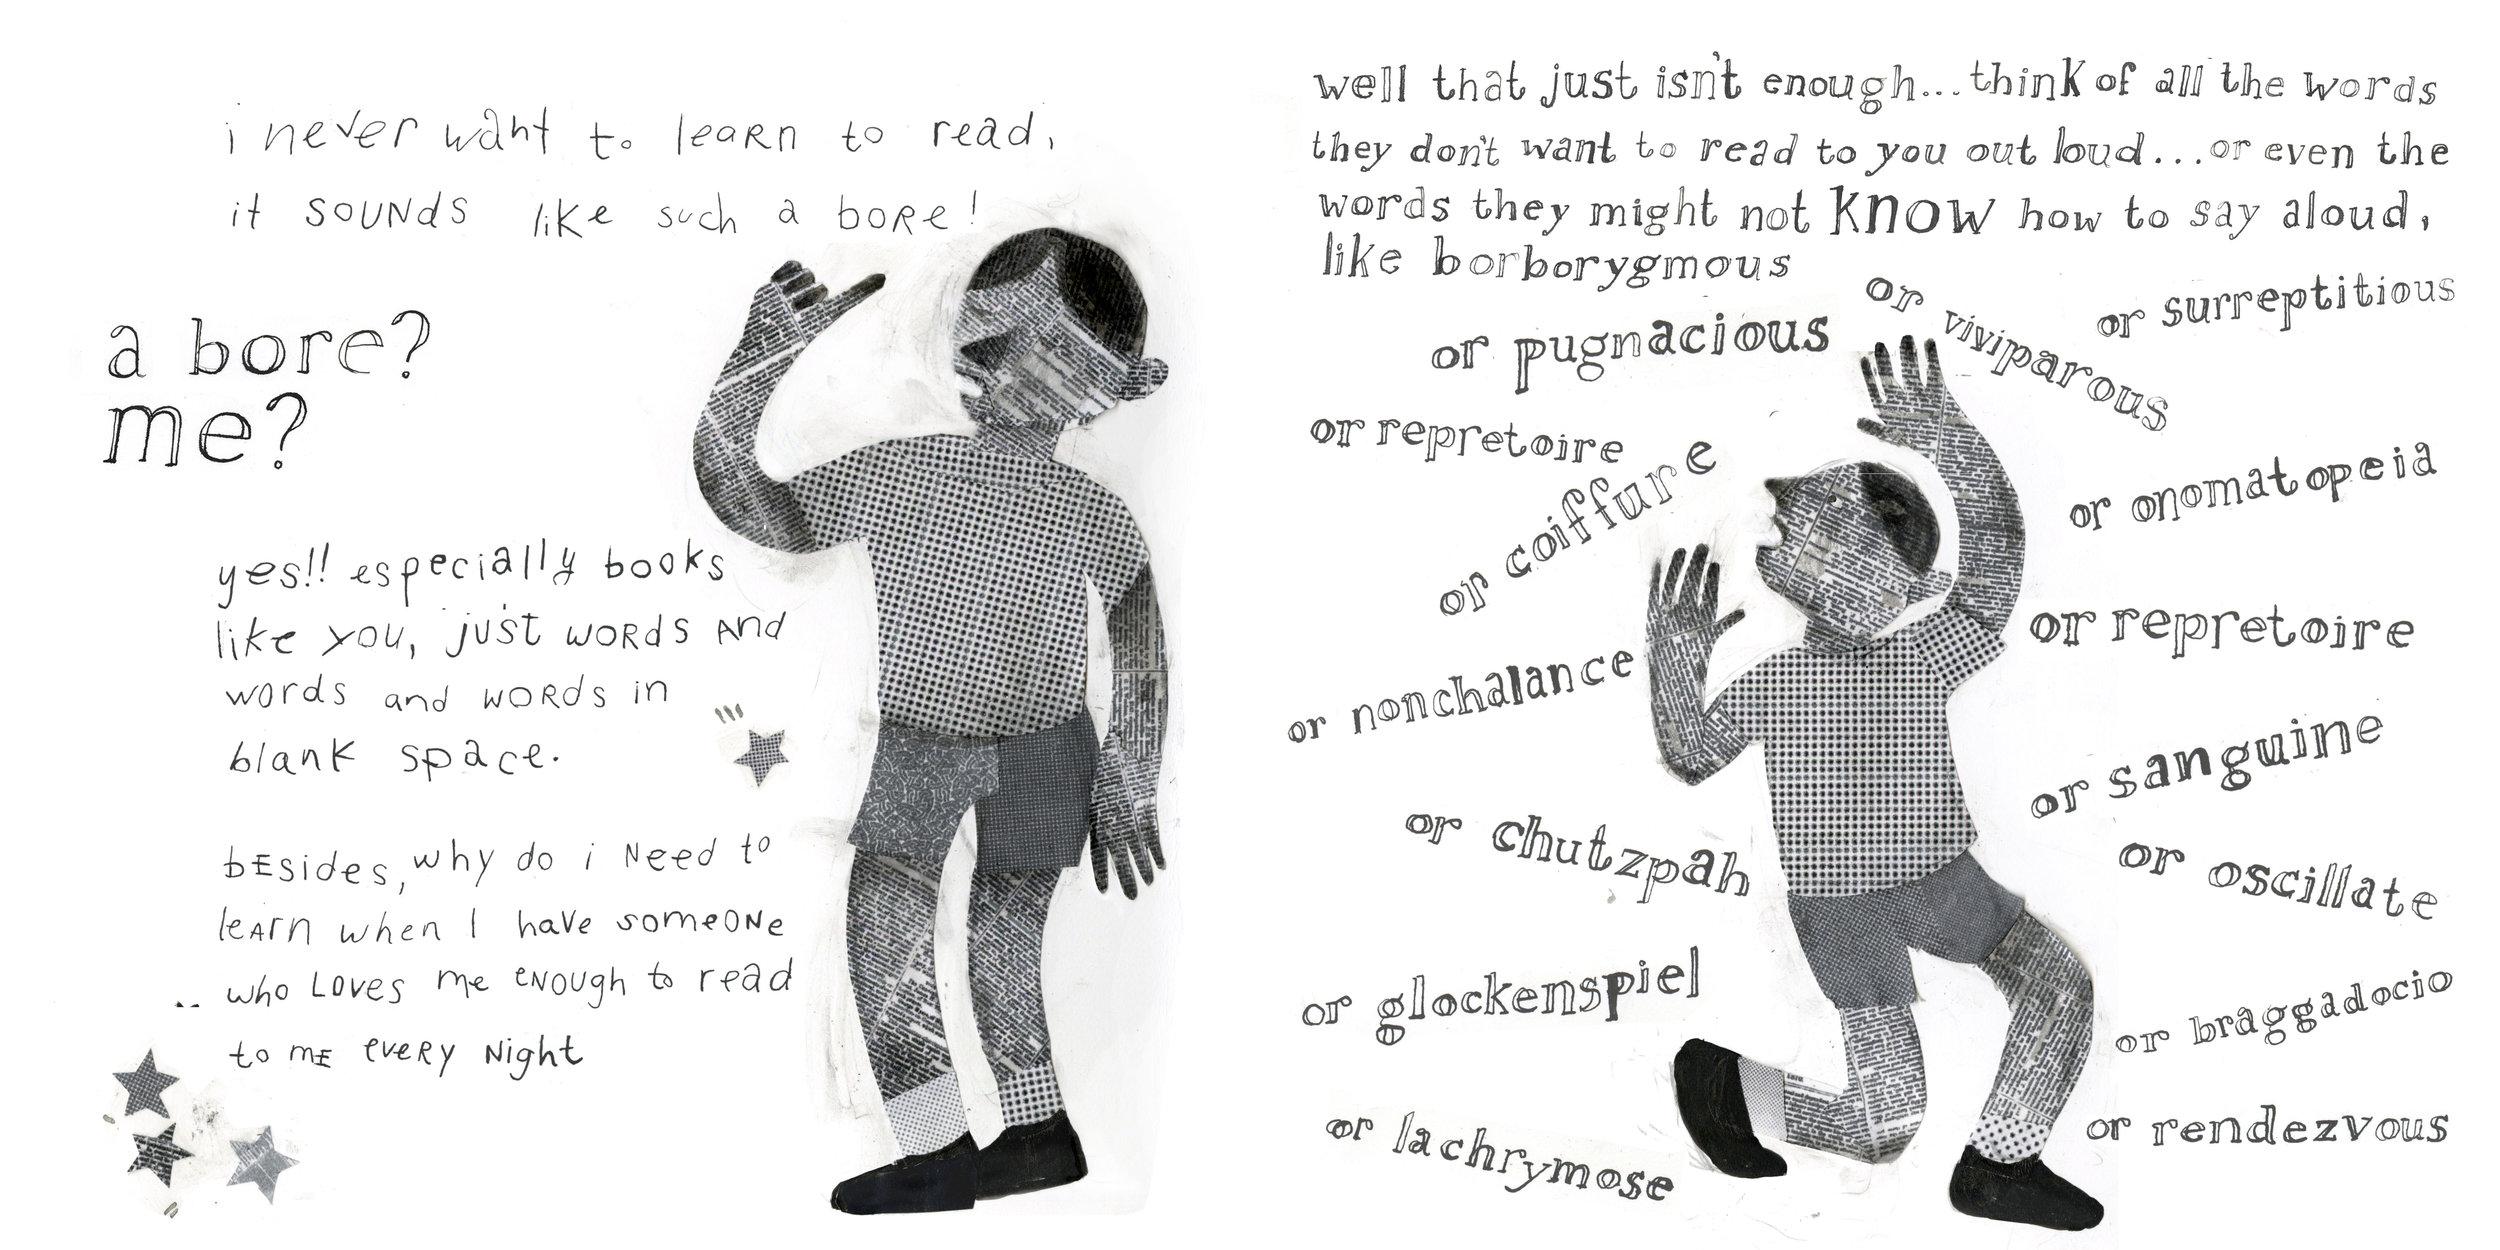 word kids book spread 2.jpg